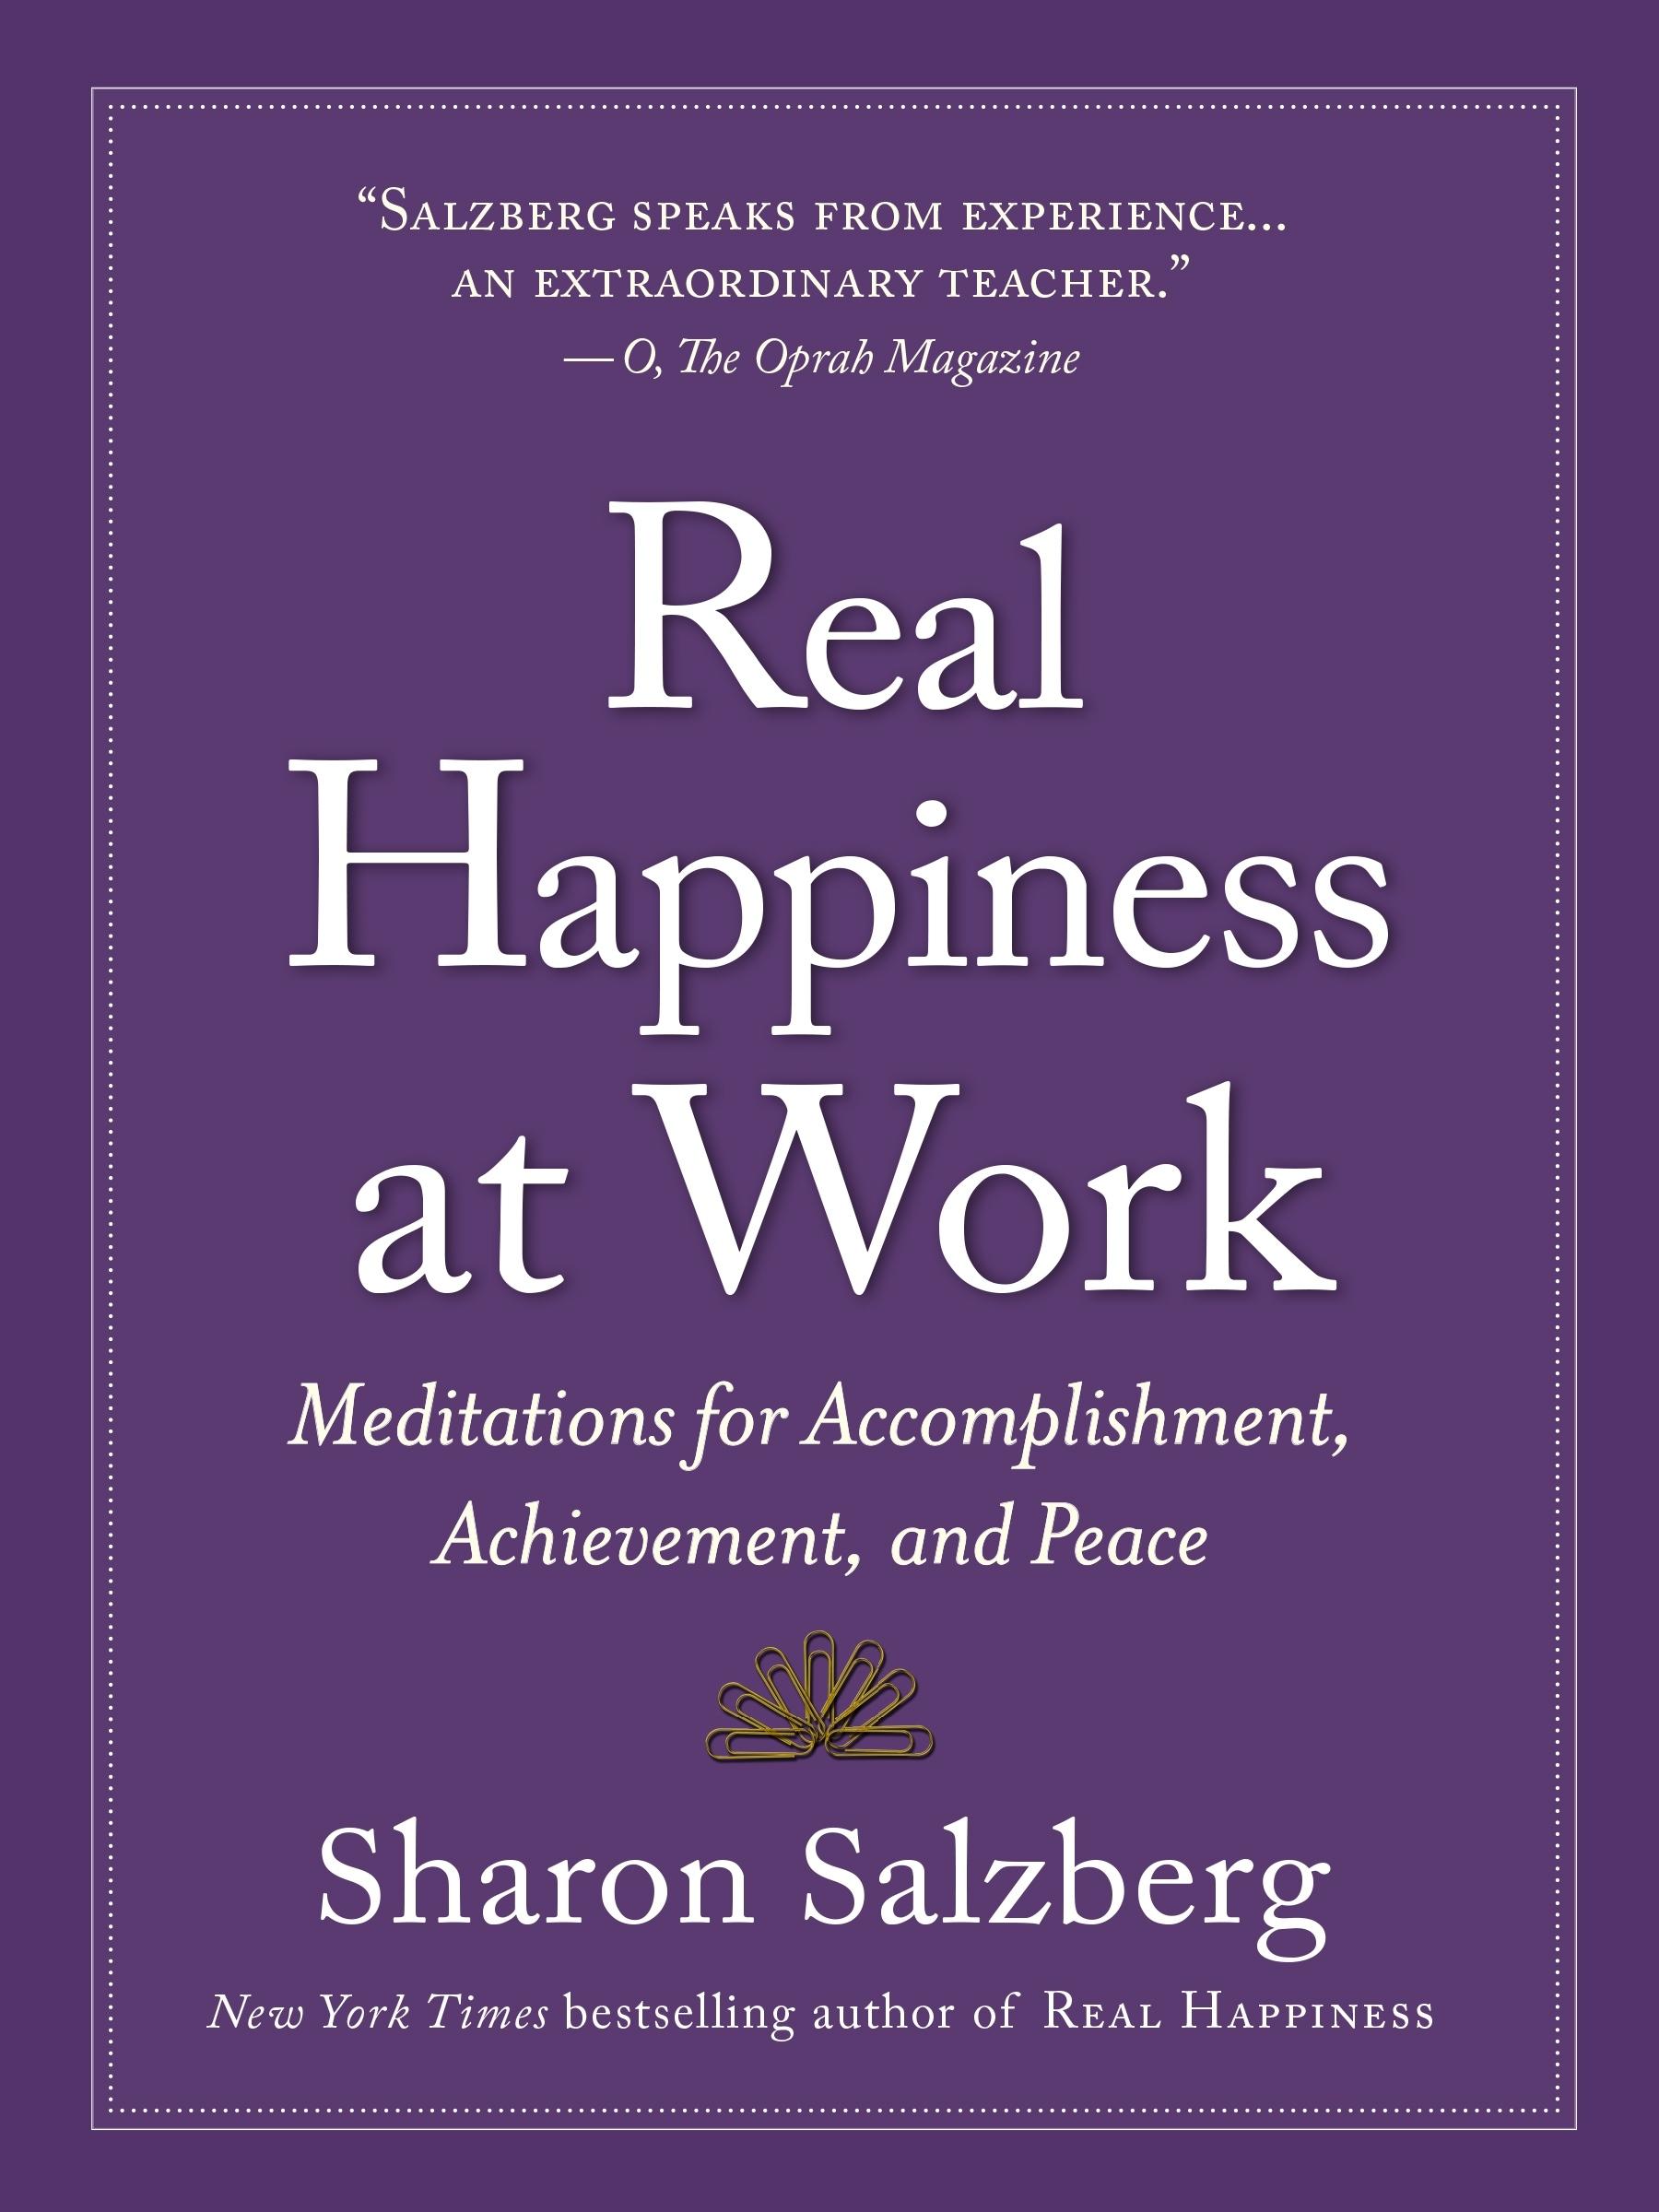 Real Happiness at Work Sharon Salzberg